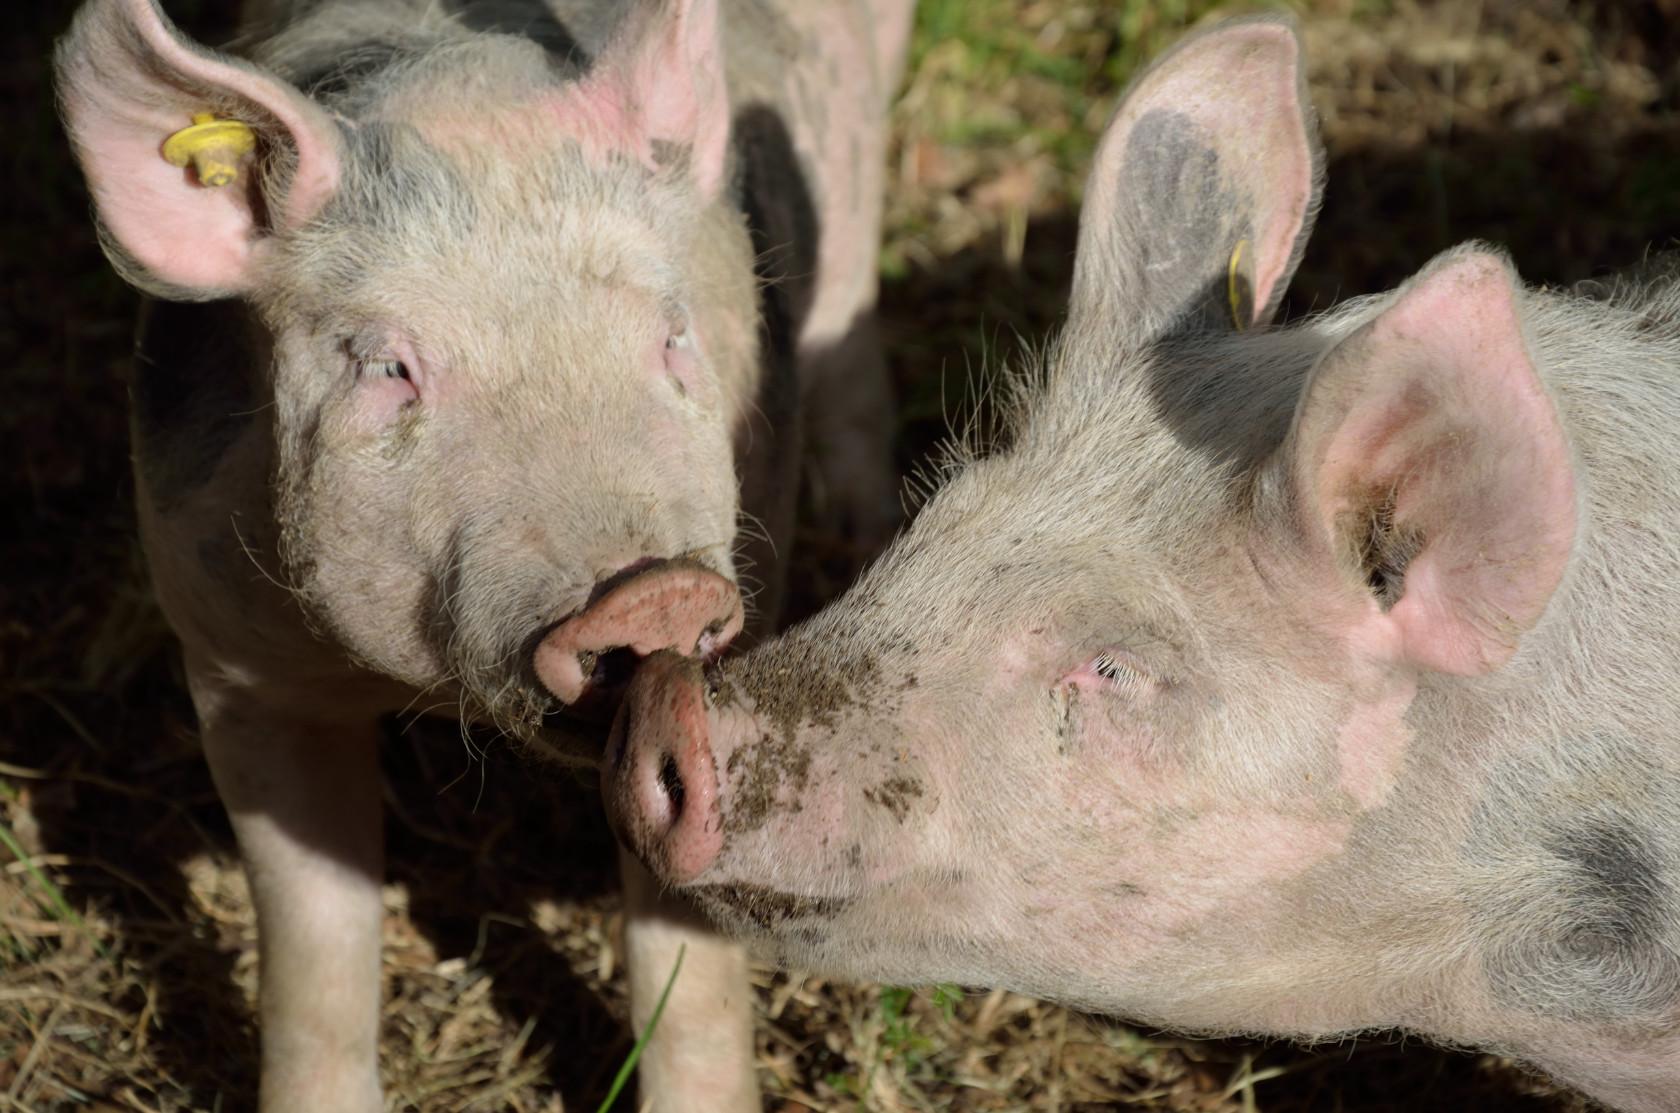 Les cochons prennent le grand air